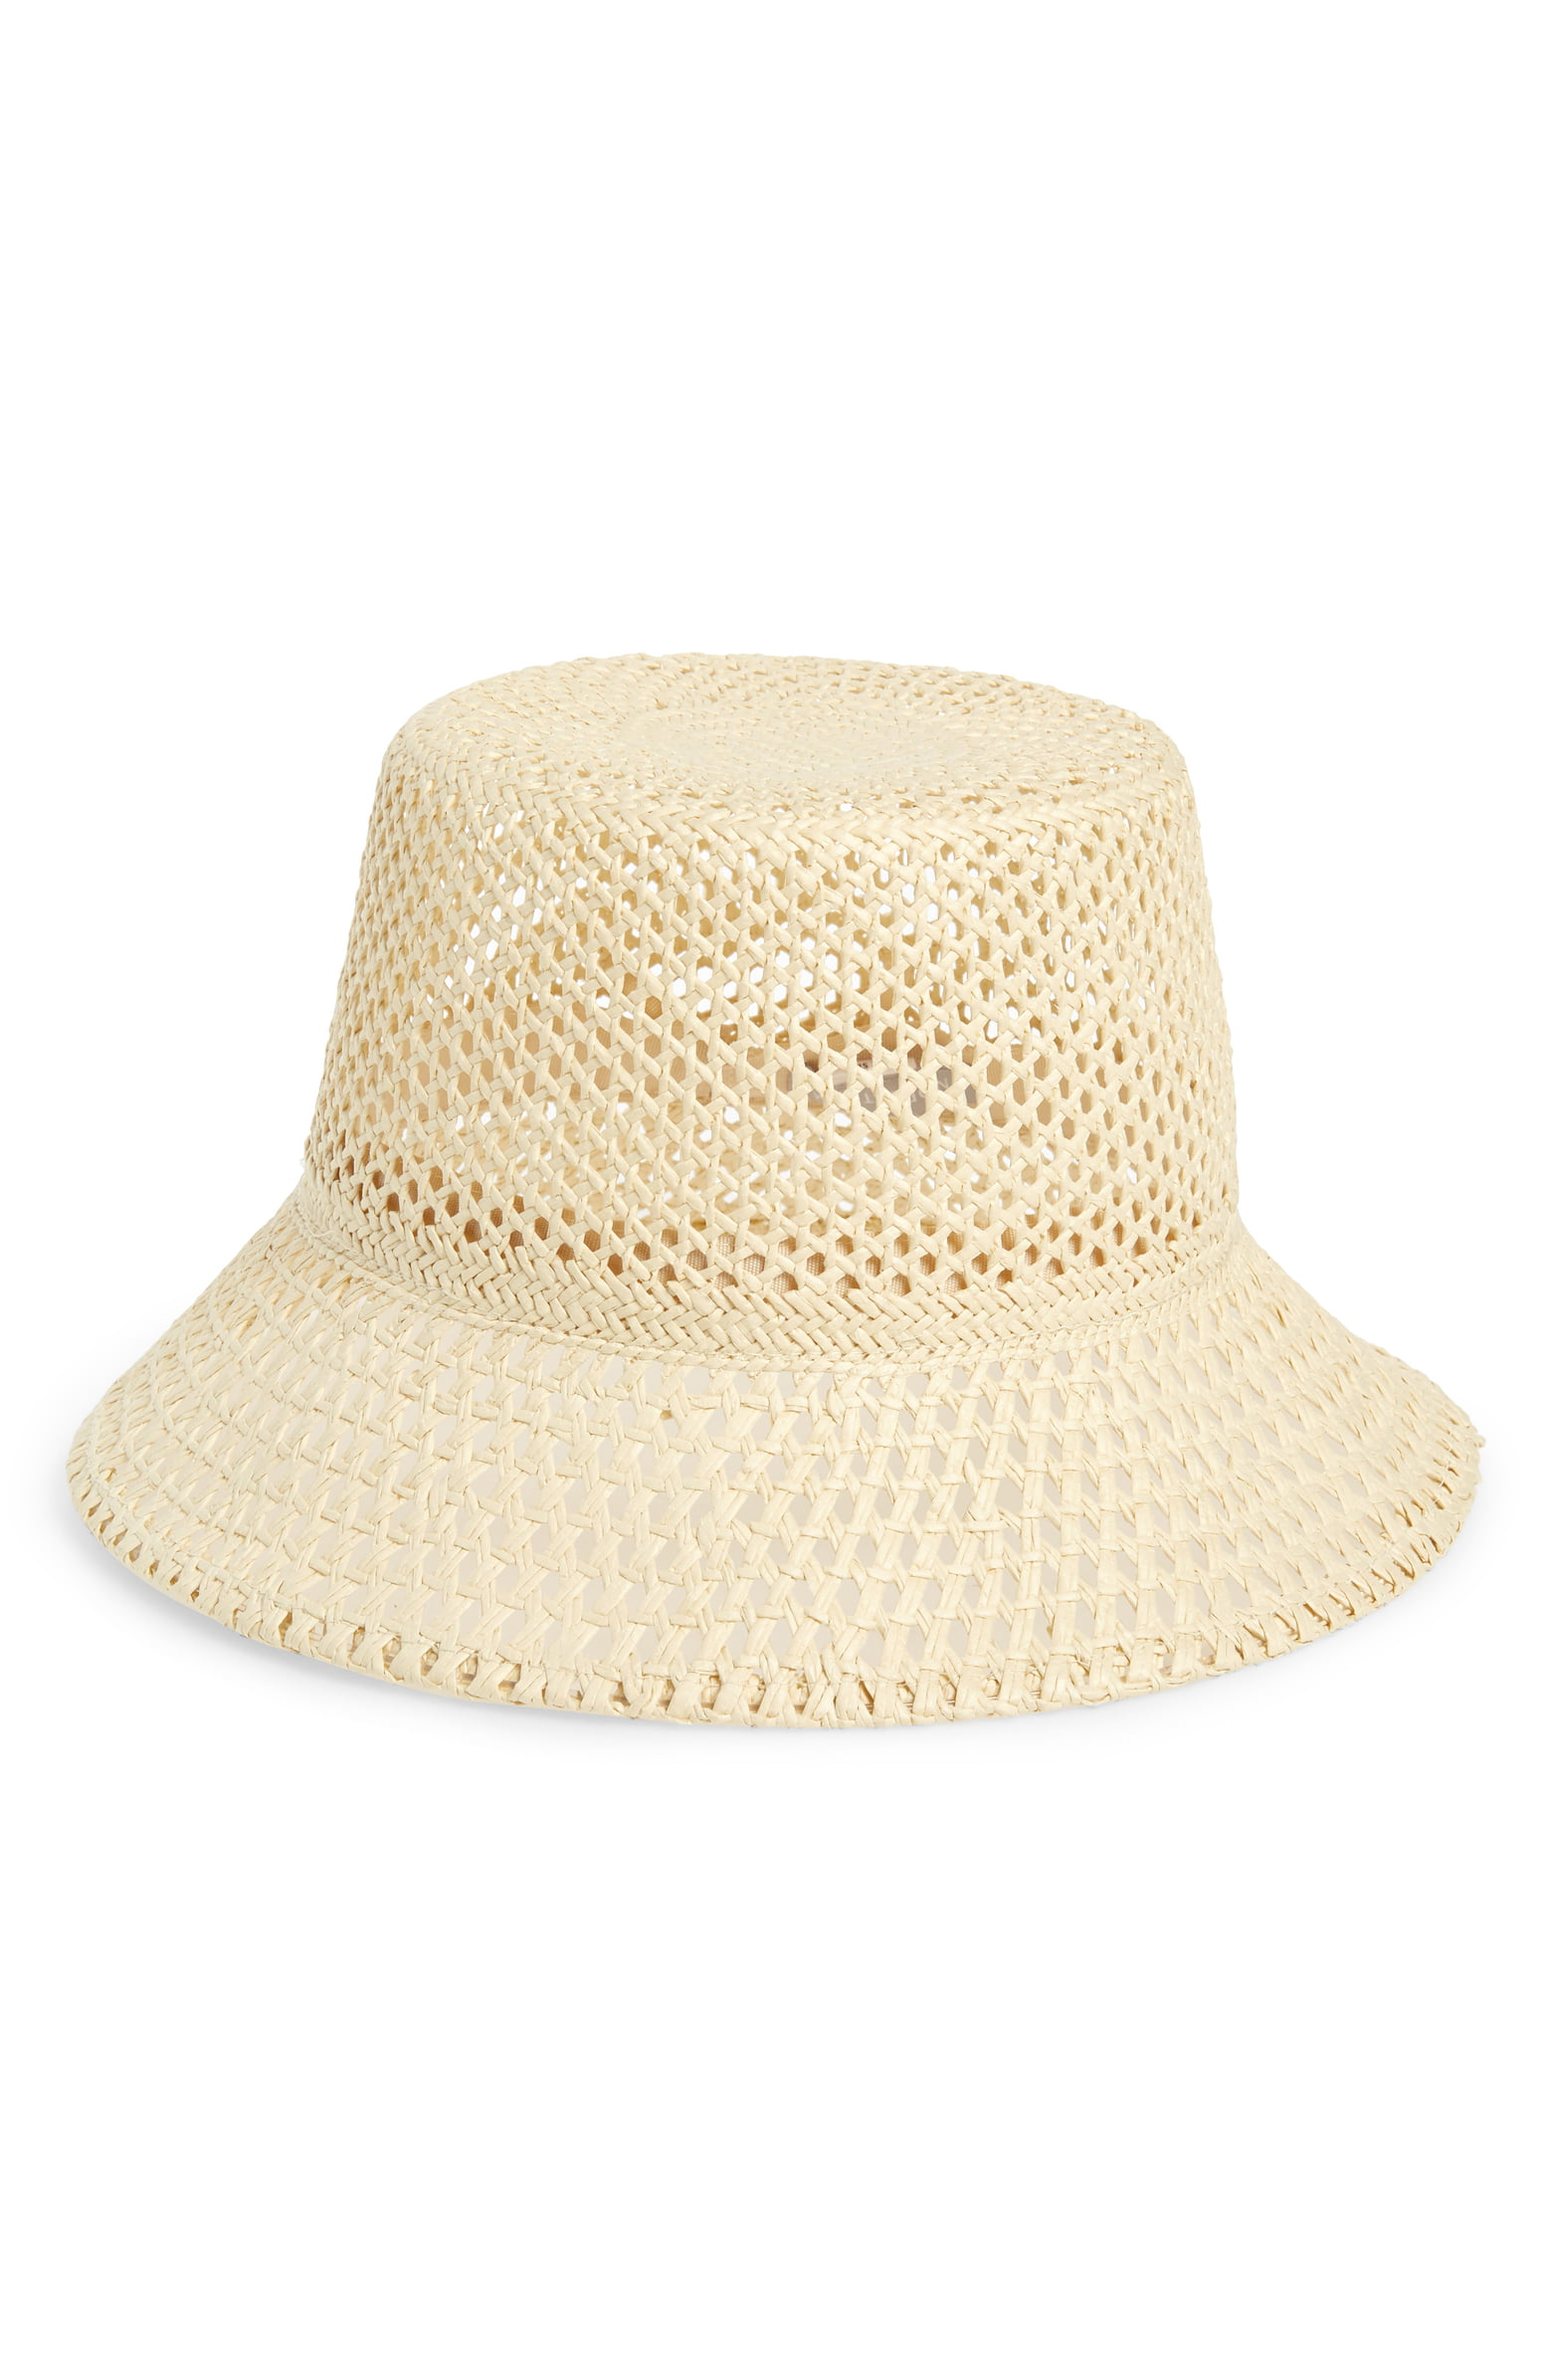 hottest summer trends bucket hat